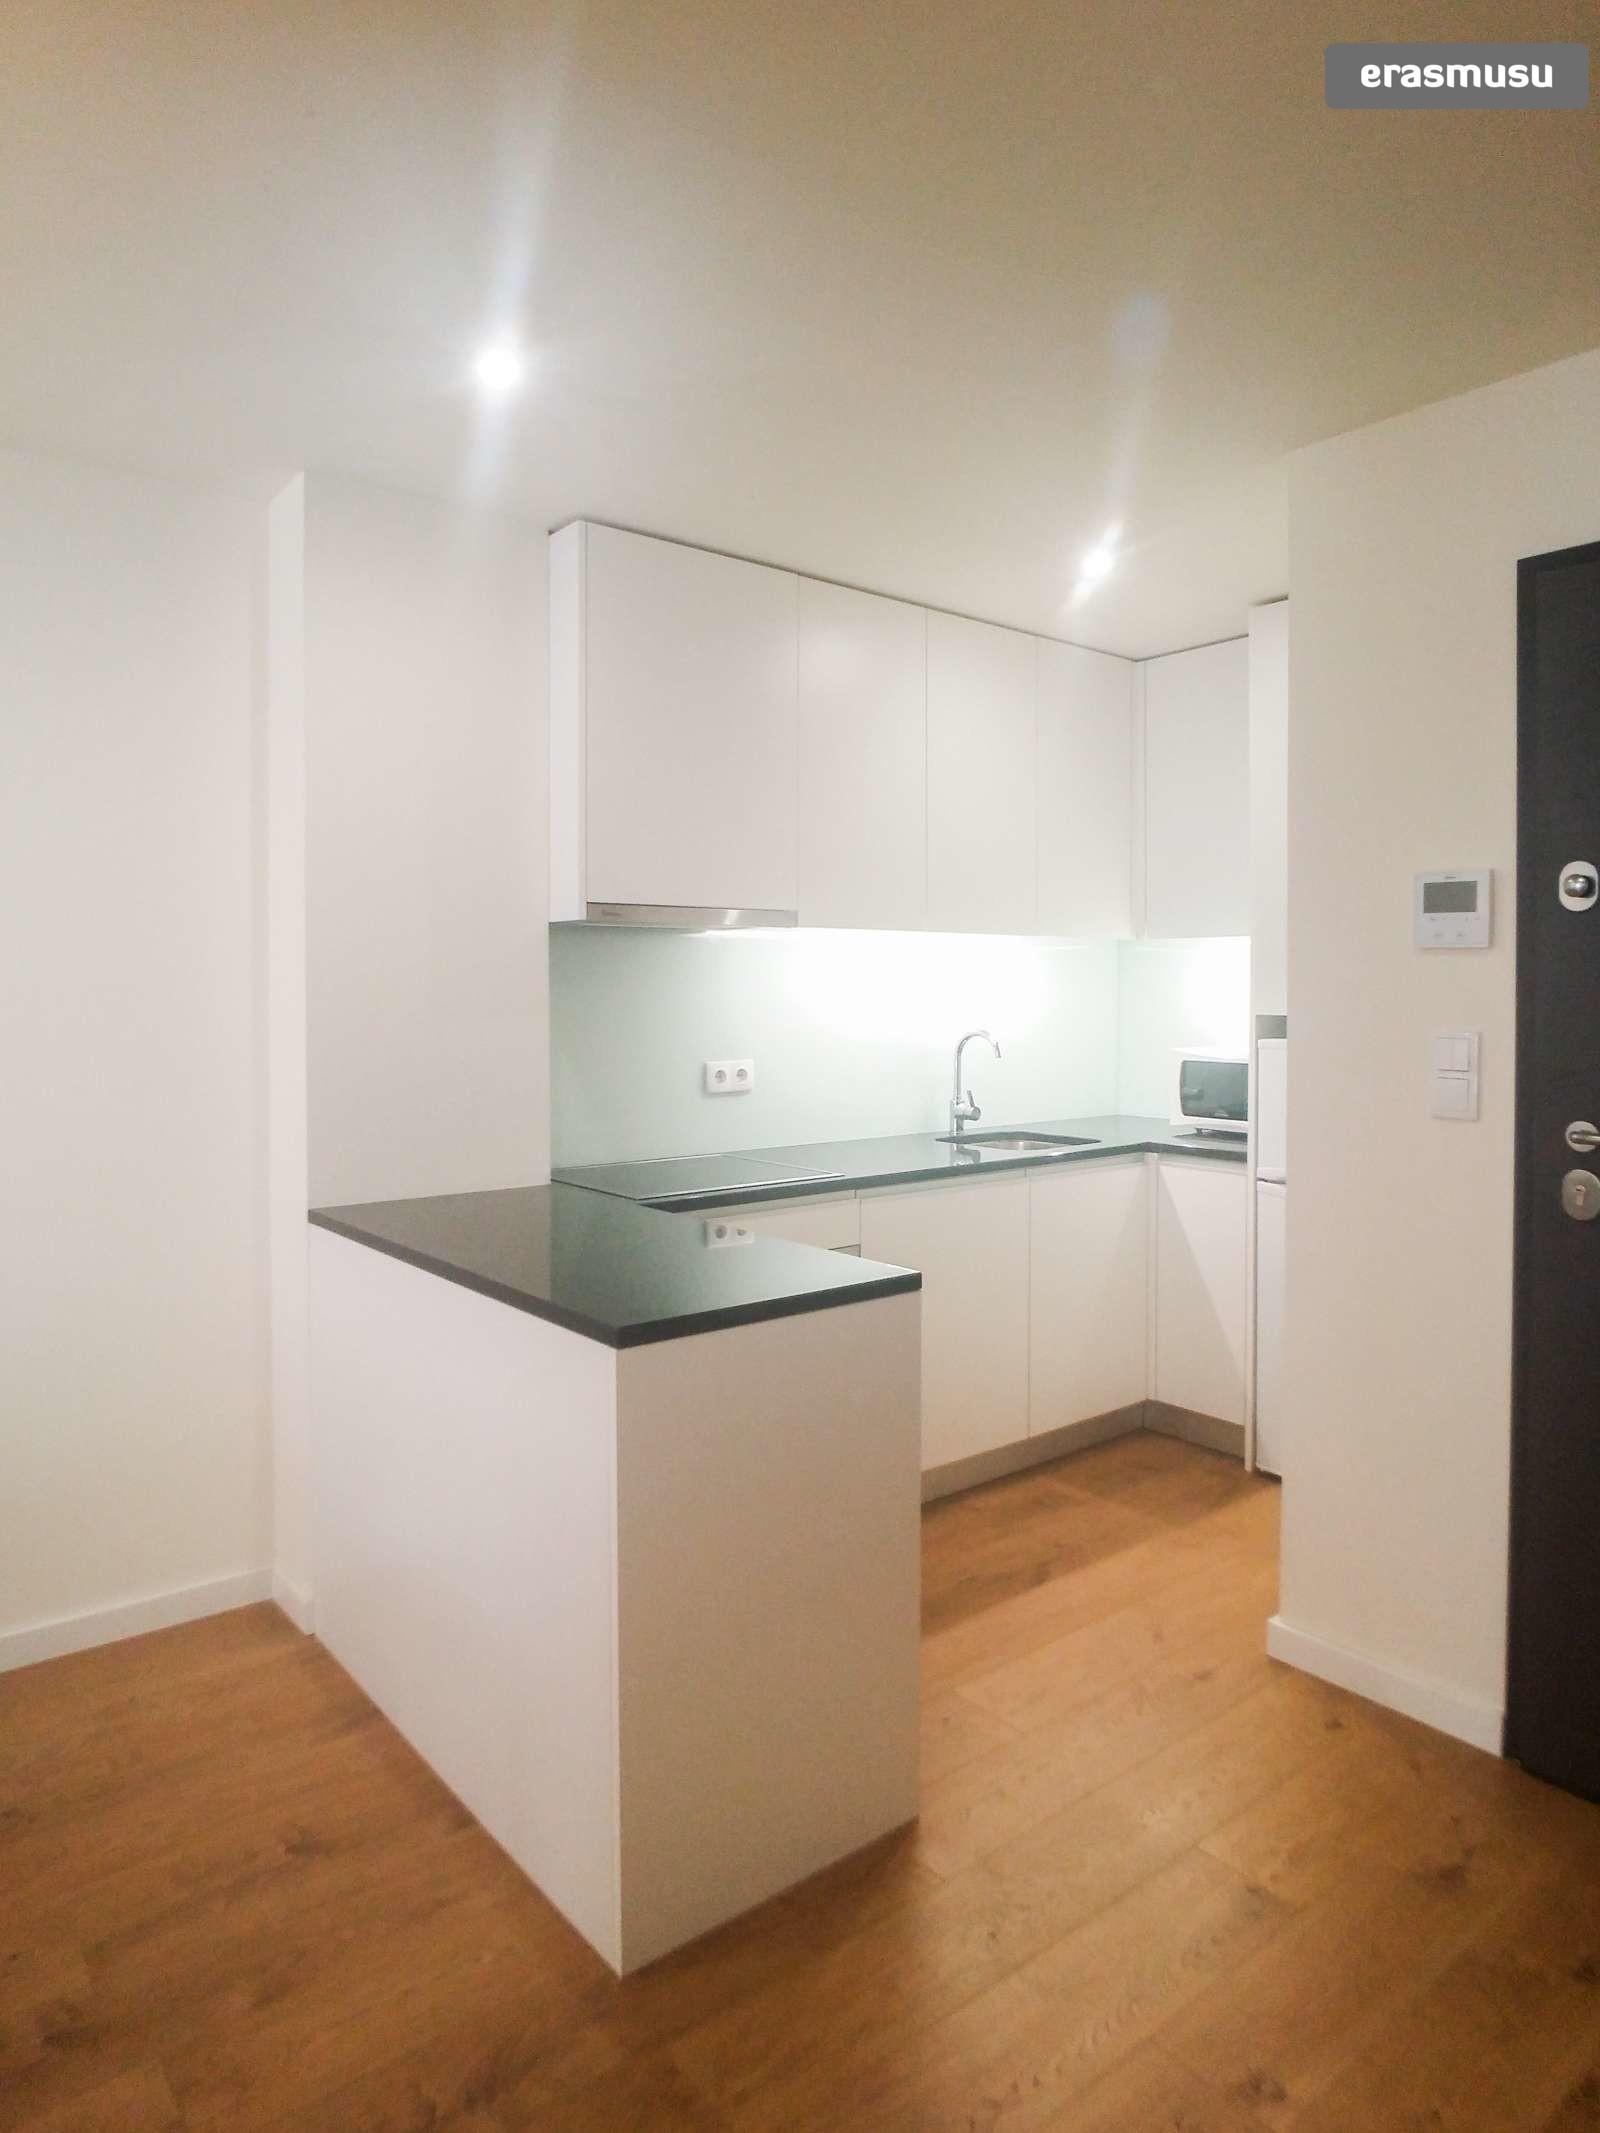 1-bedroom-apartment-rent-santo-ildefonso-96e487e9a5e102594e99485